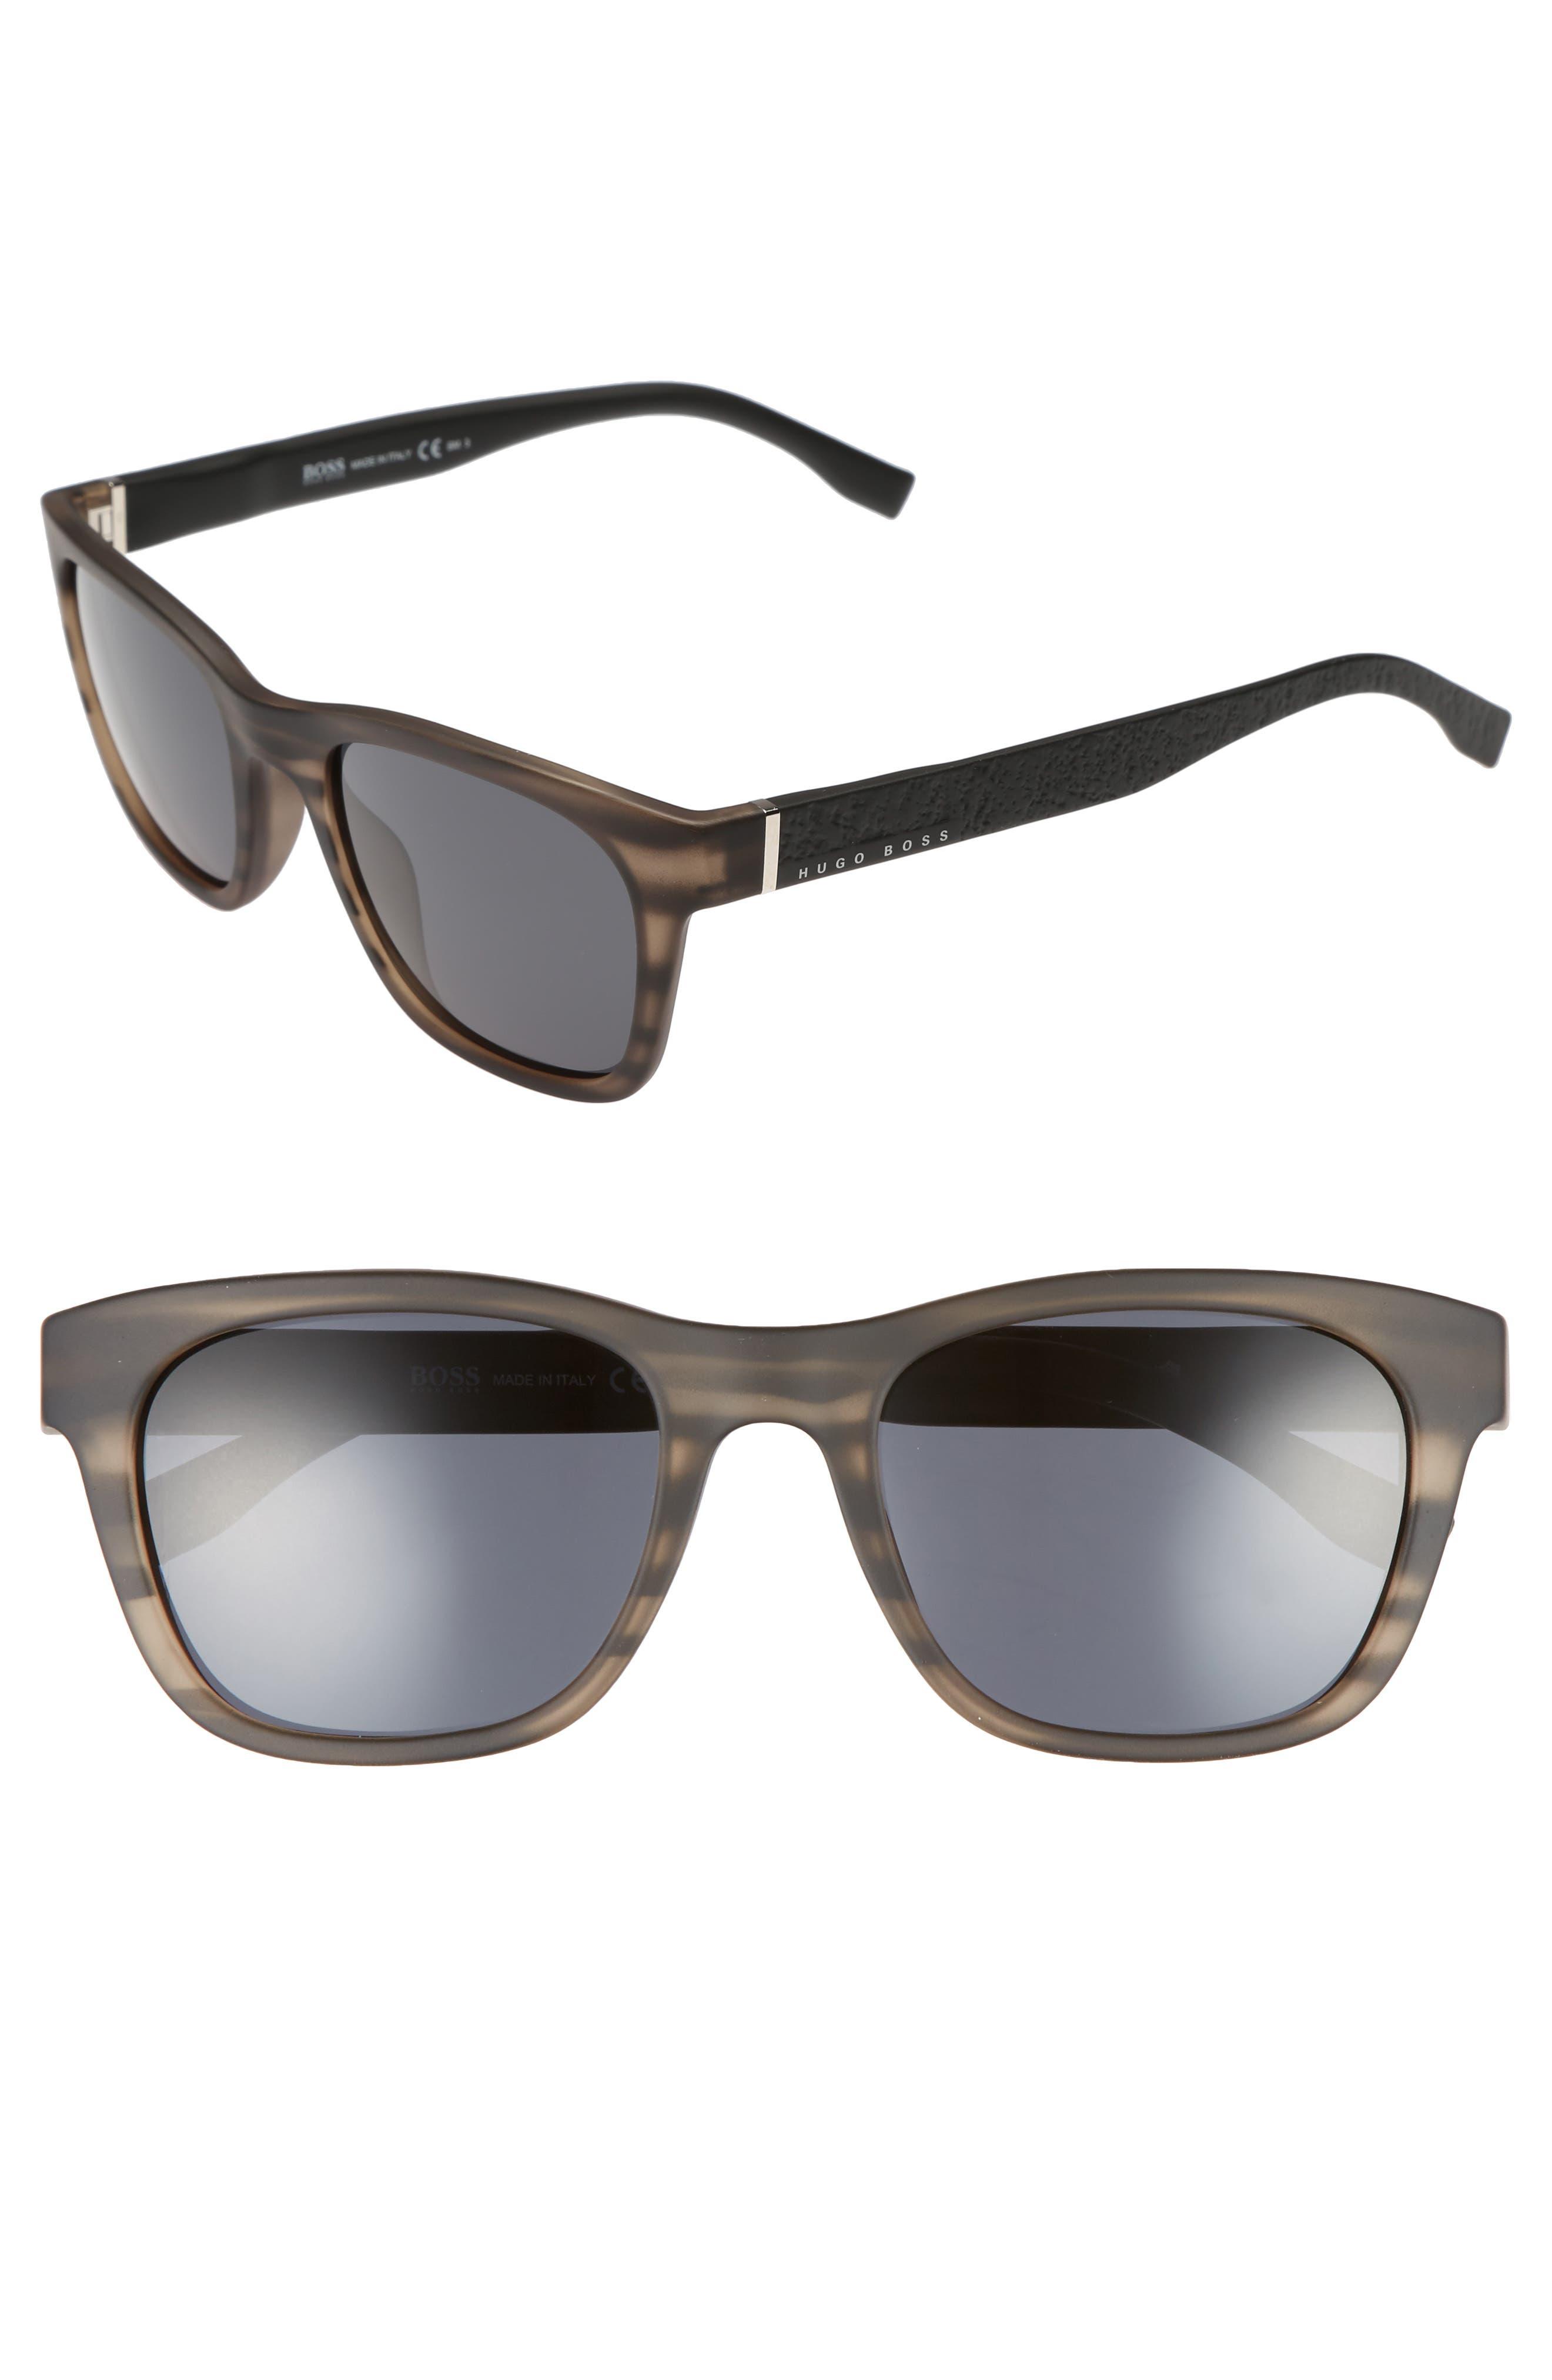 53mm Polarized Sunglasses,                             Main thumbnail 1, color,                             Gray Horn Black/ Gray Blue